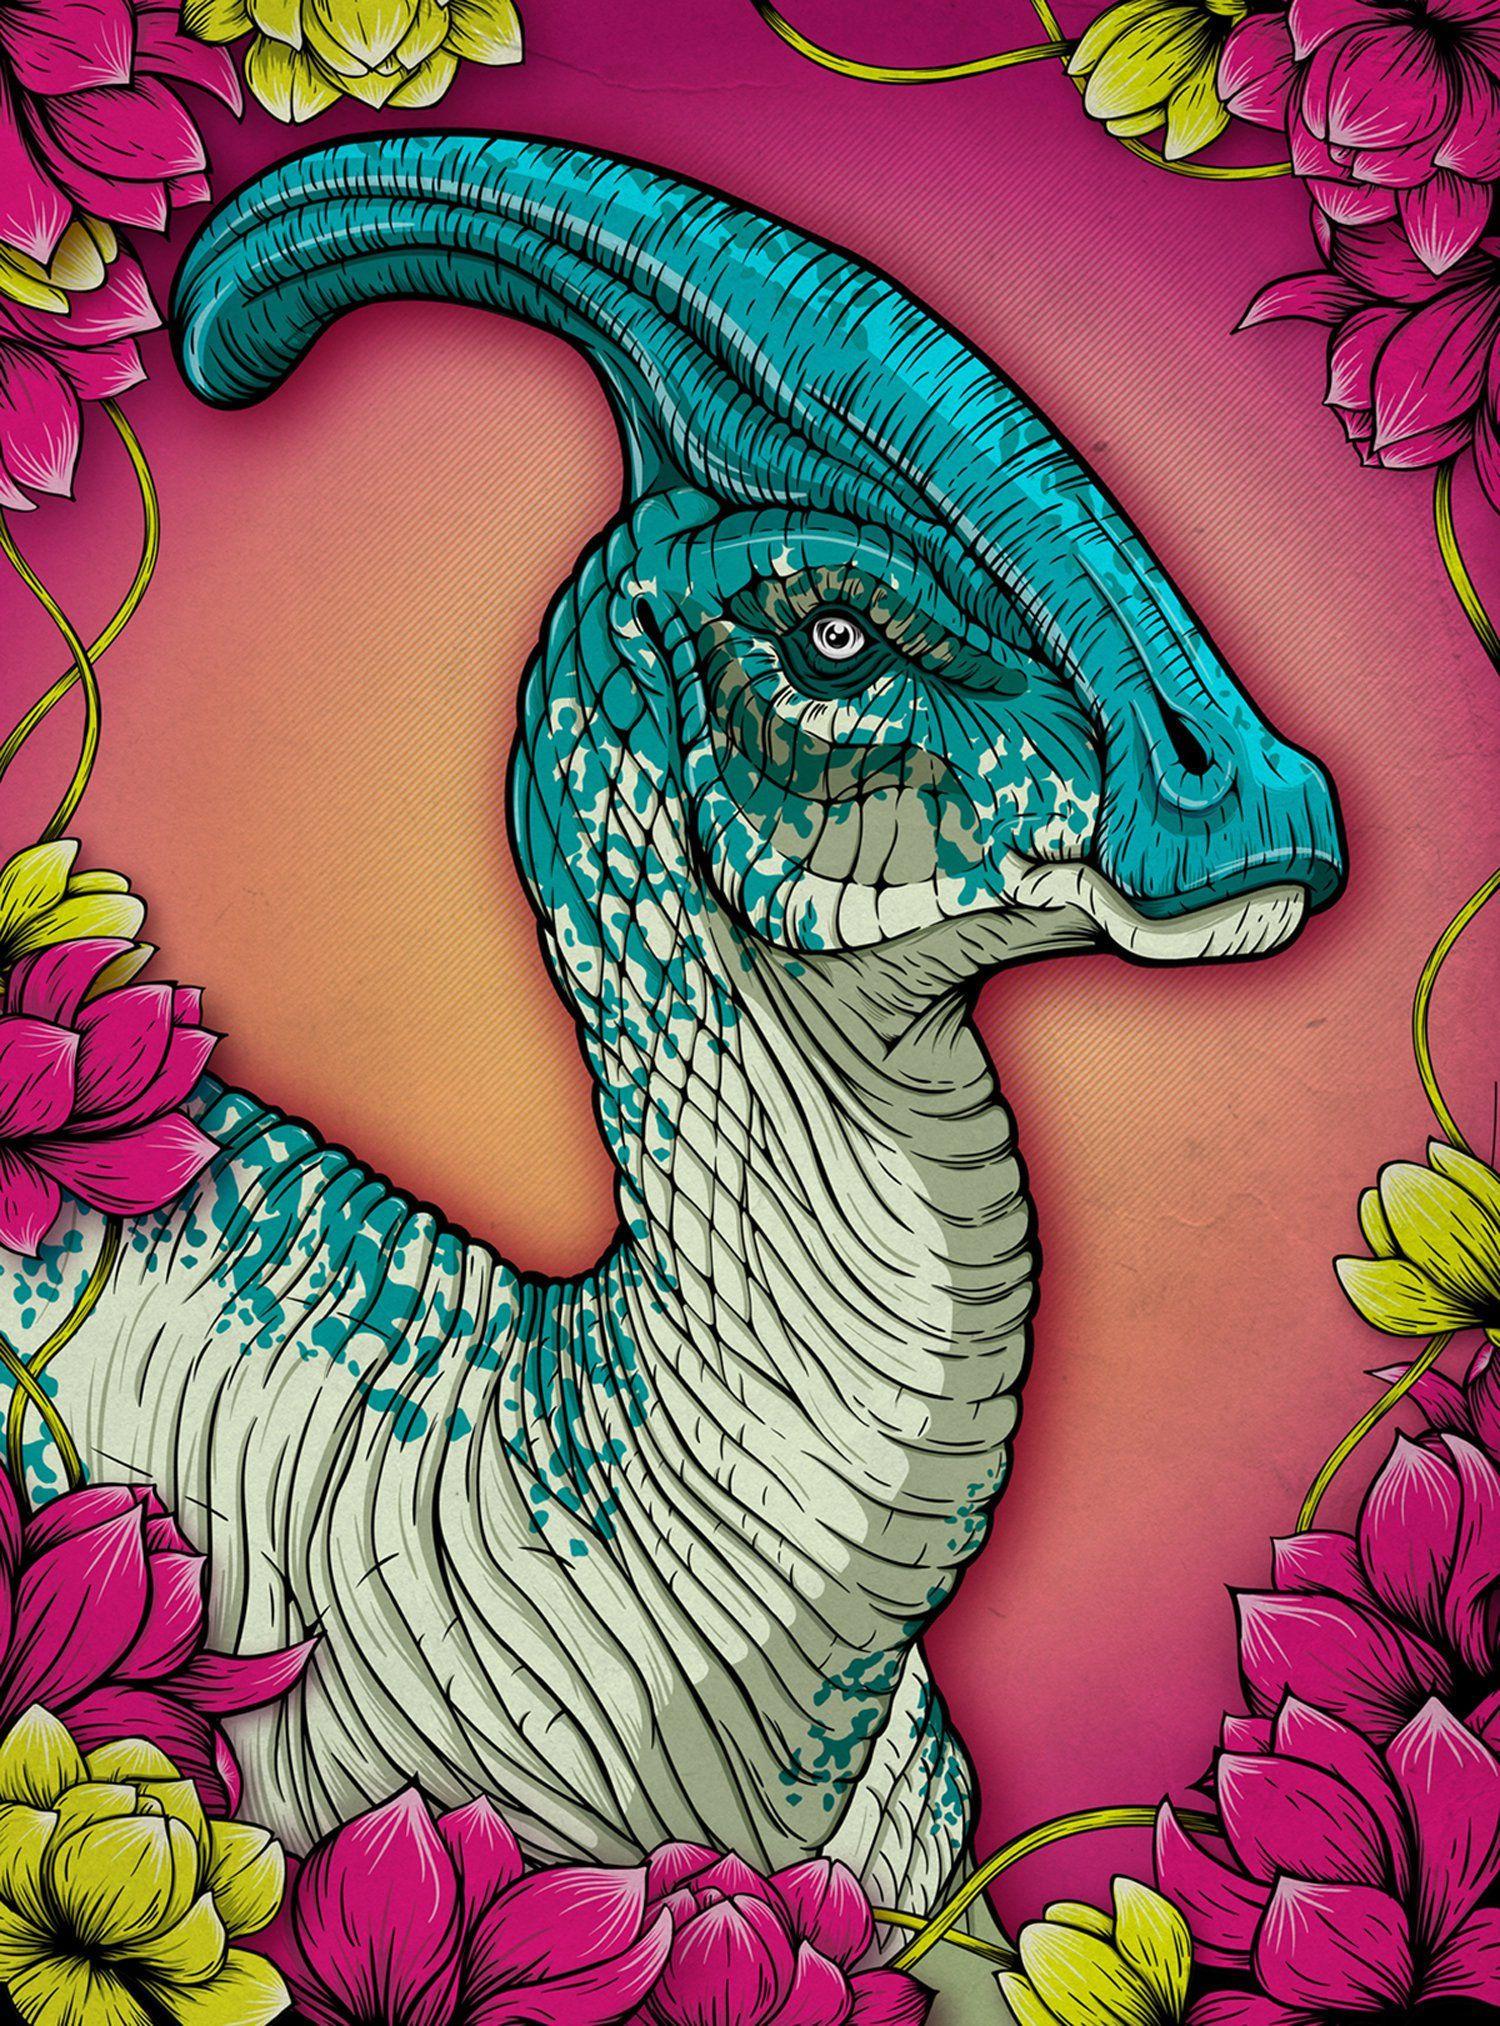 Parasaurolophus Dinosaur Print - Jurassic World